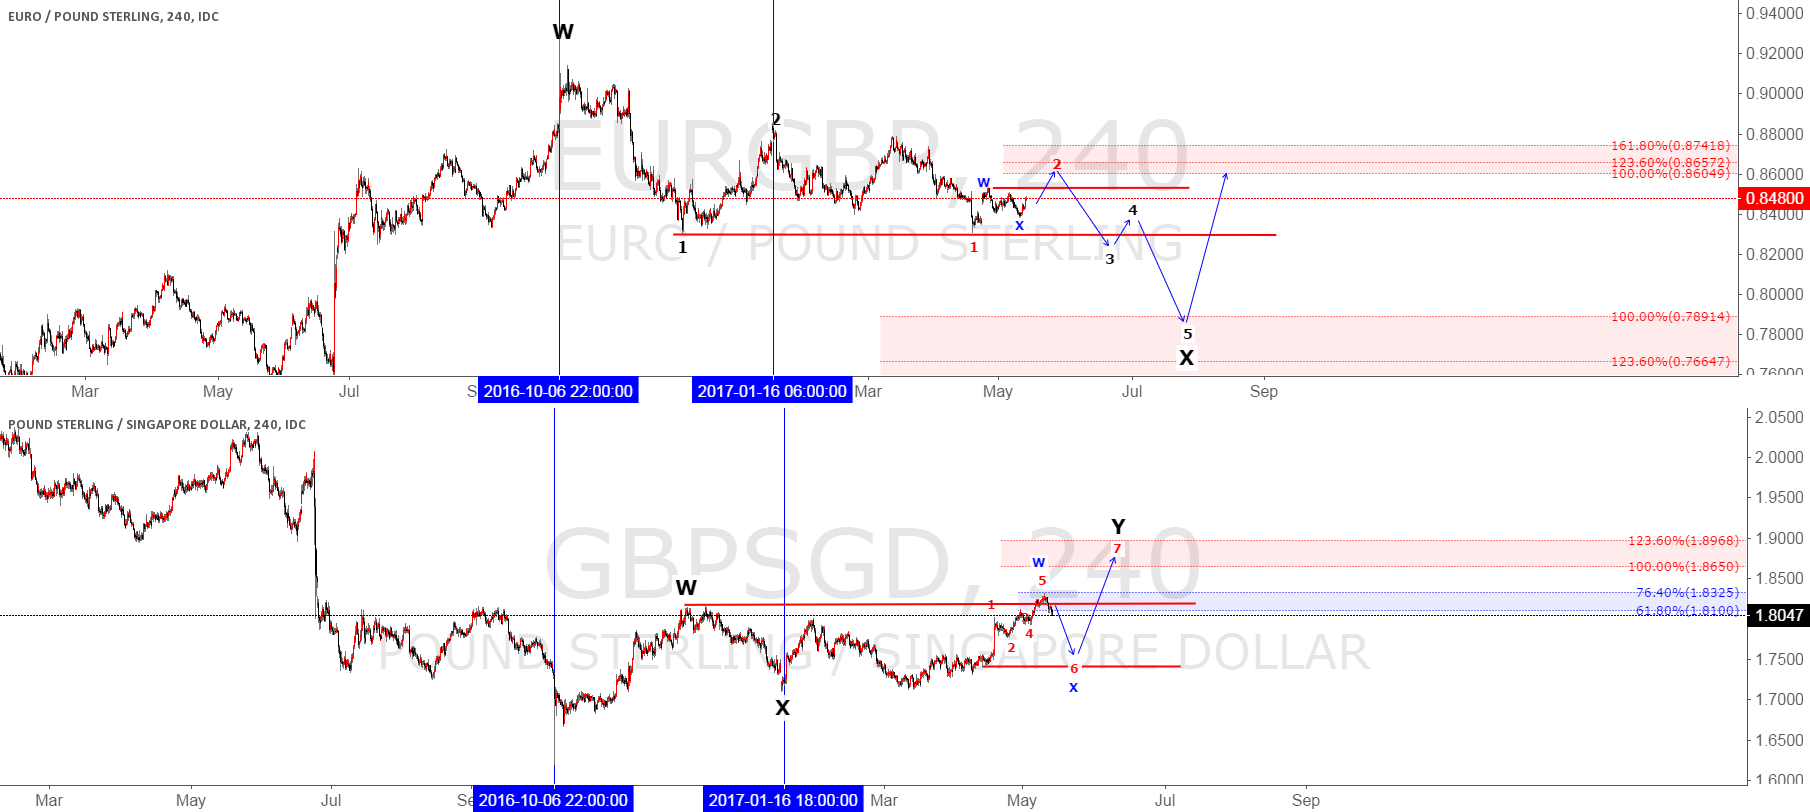 EURGBP correlation GBPSGD Elliot wave analysis